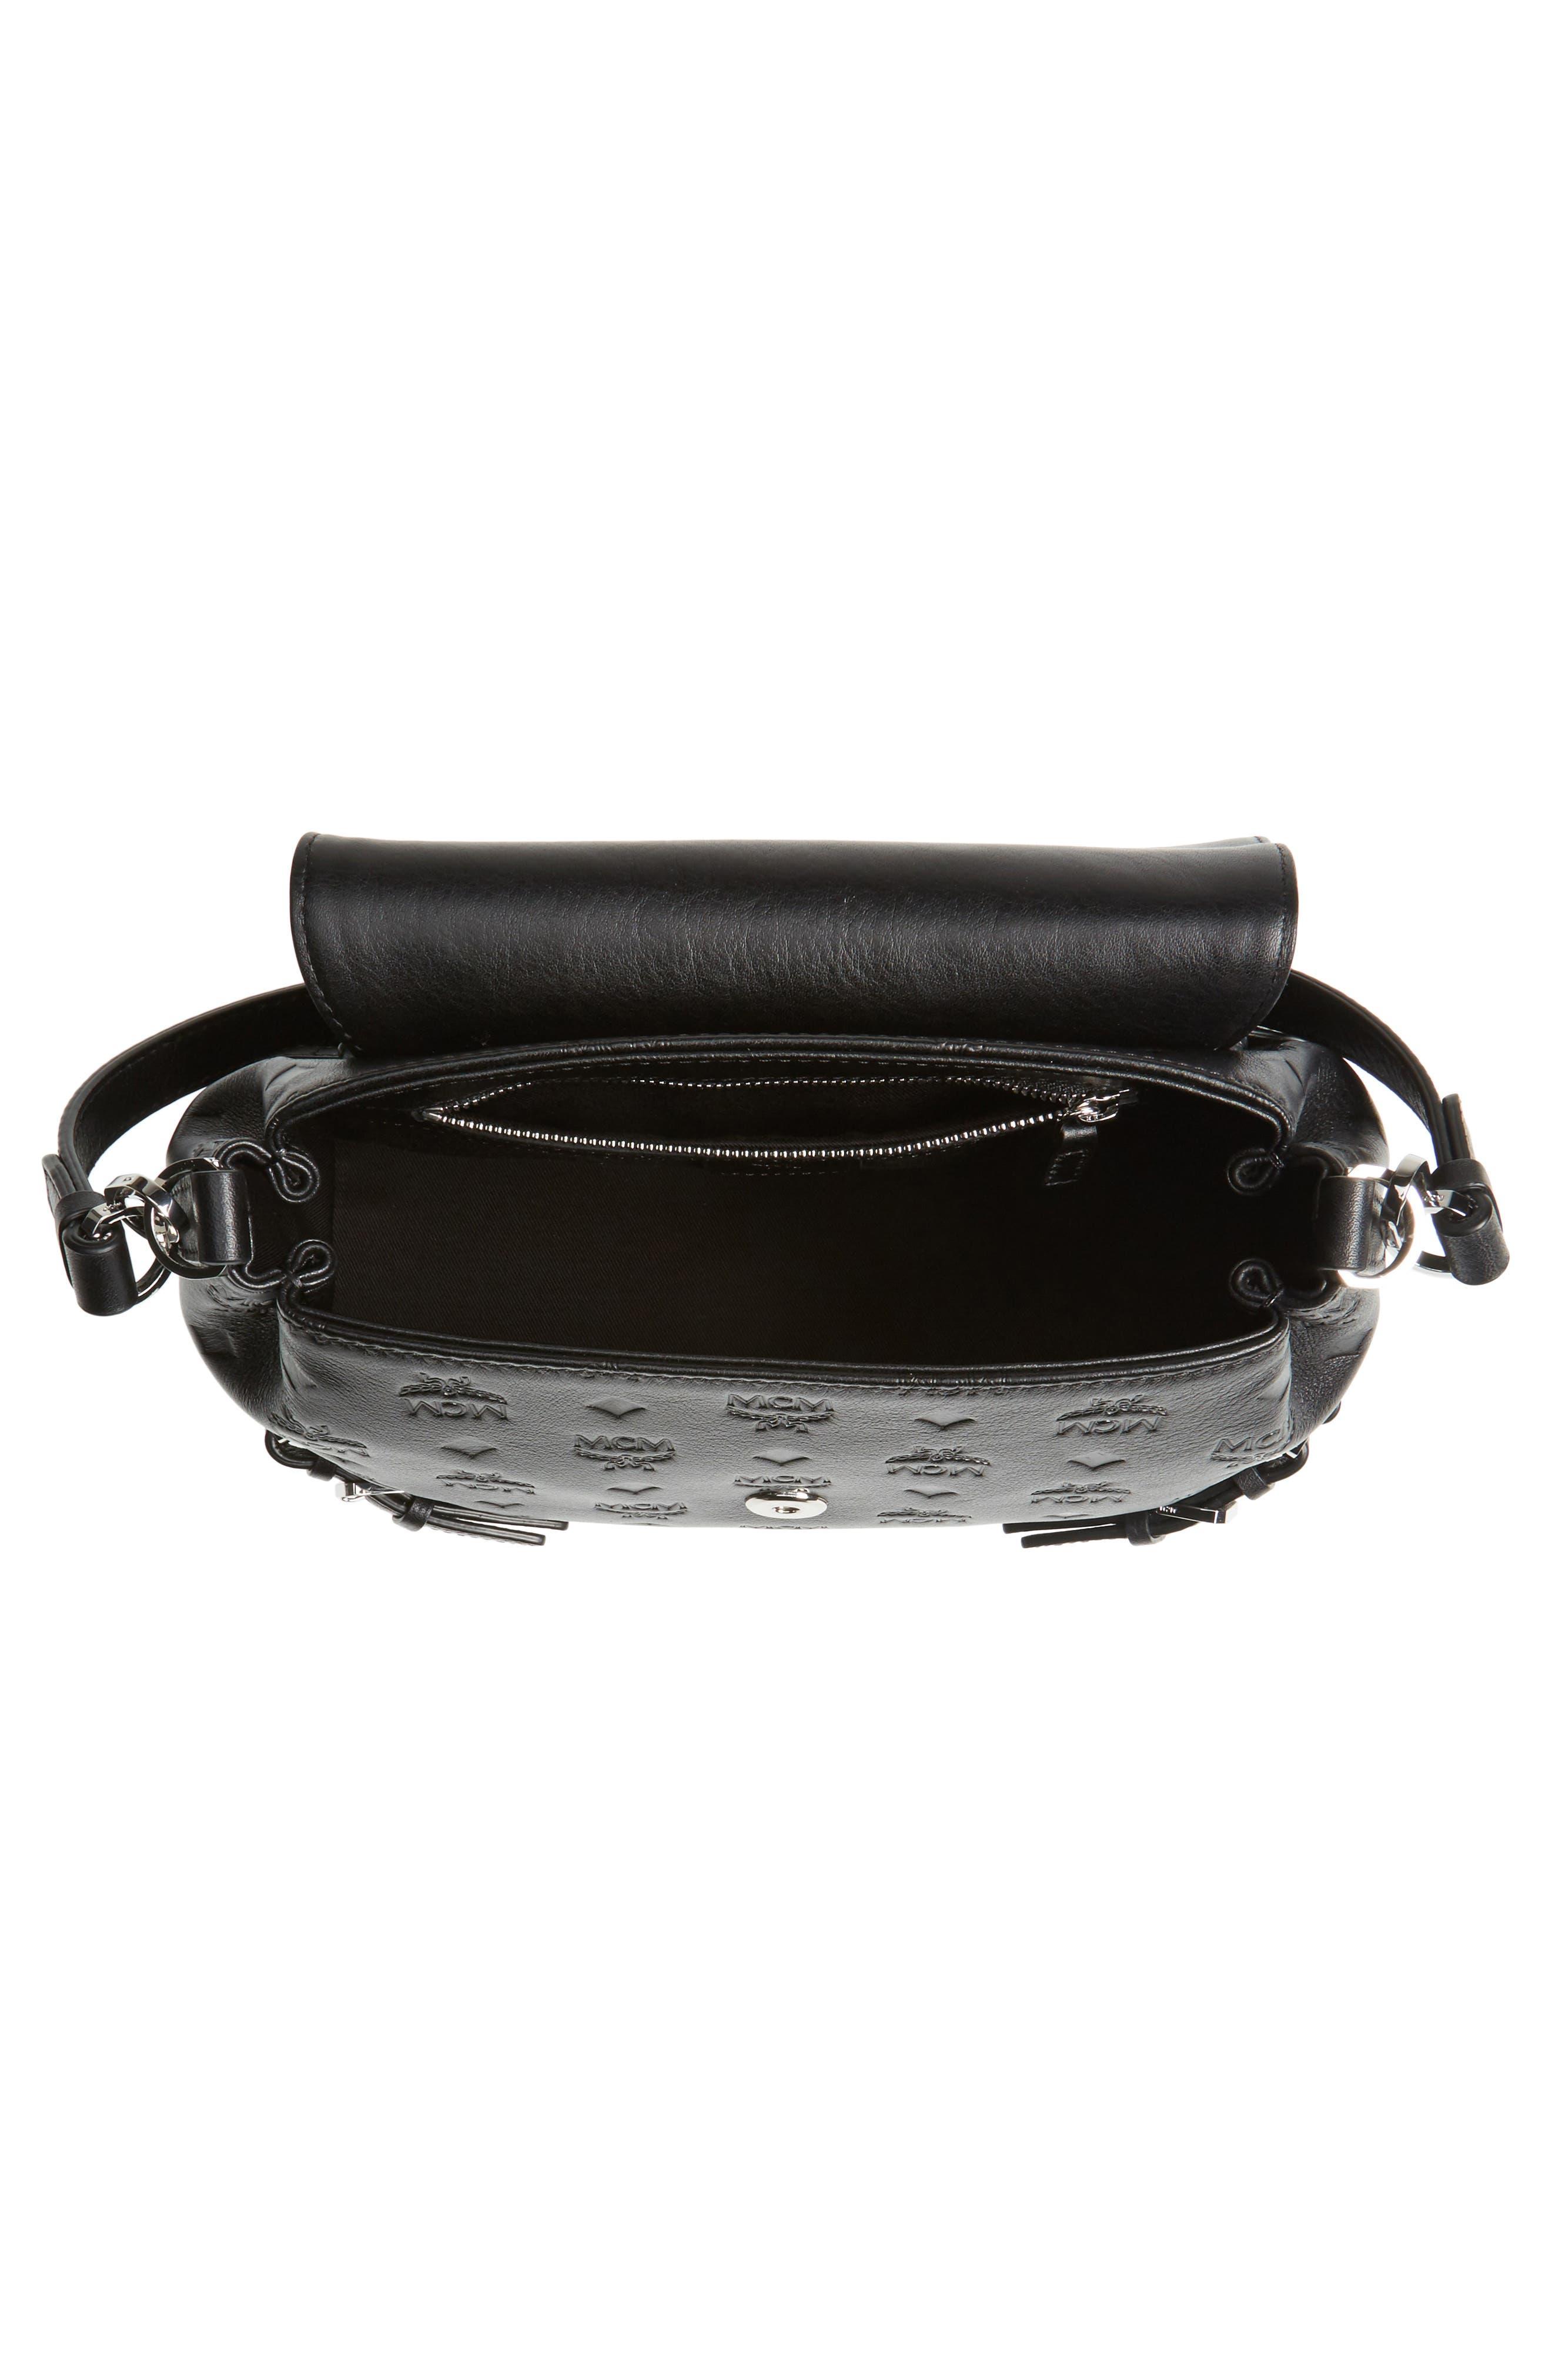 Signature Monogram Embossed Leather Shoulder/Crossbody Bag,                             Alternate thumbnail 4, color,                             001